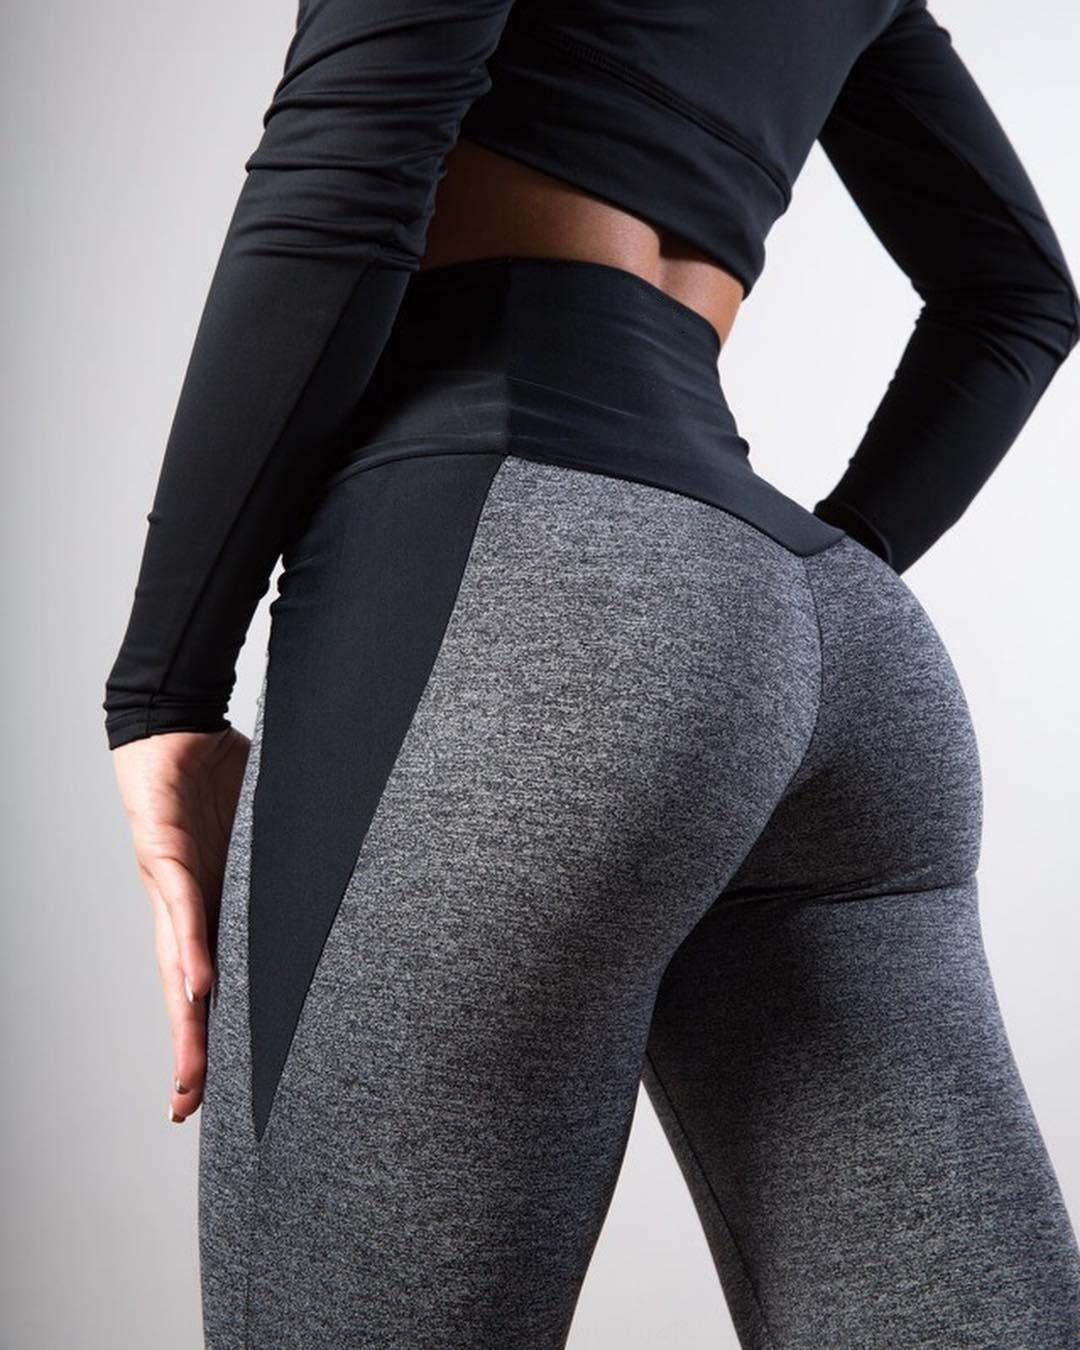 Sexy color matching yoga hip lifting XP00 Sexy color matching yoga hip lifting XP00 sports pants sports pants